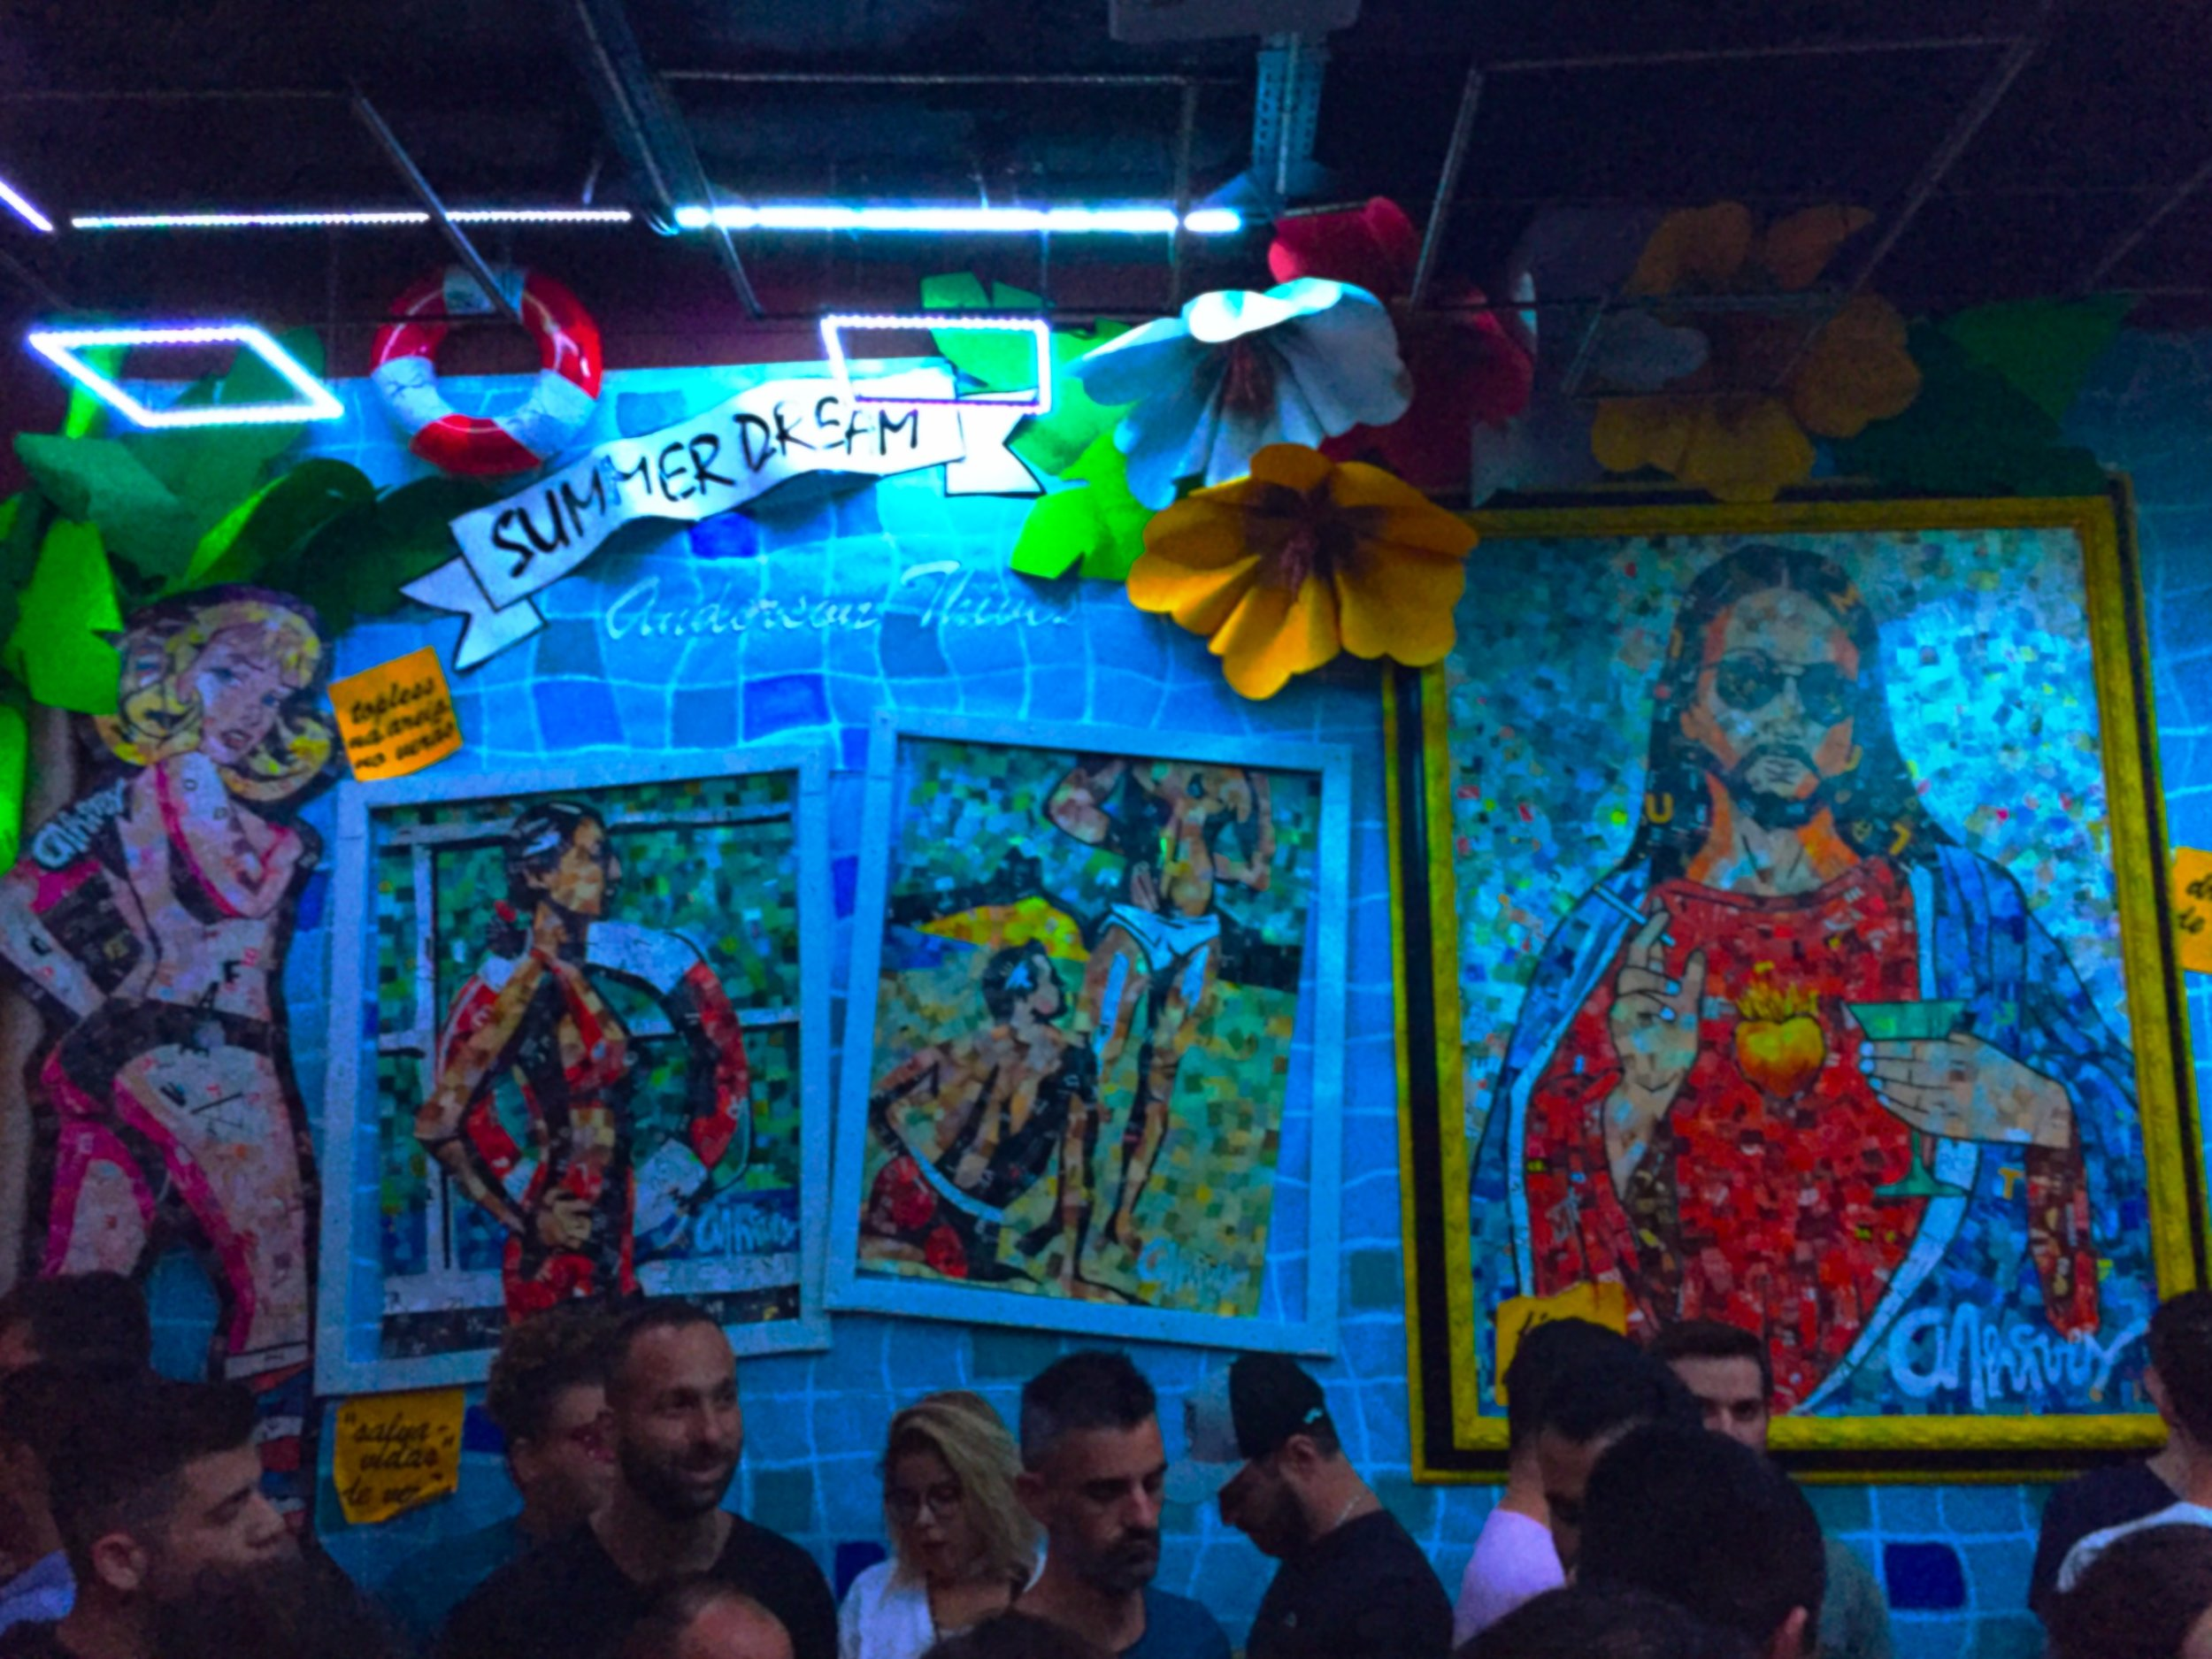 Galeria Café in Rio